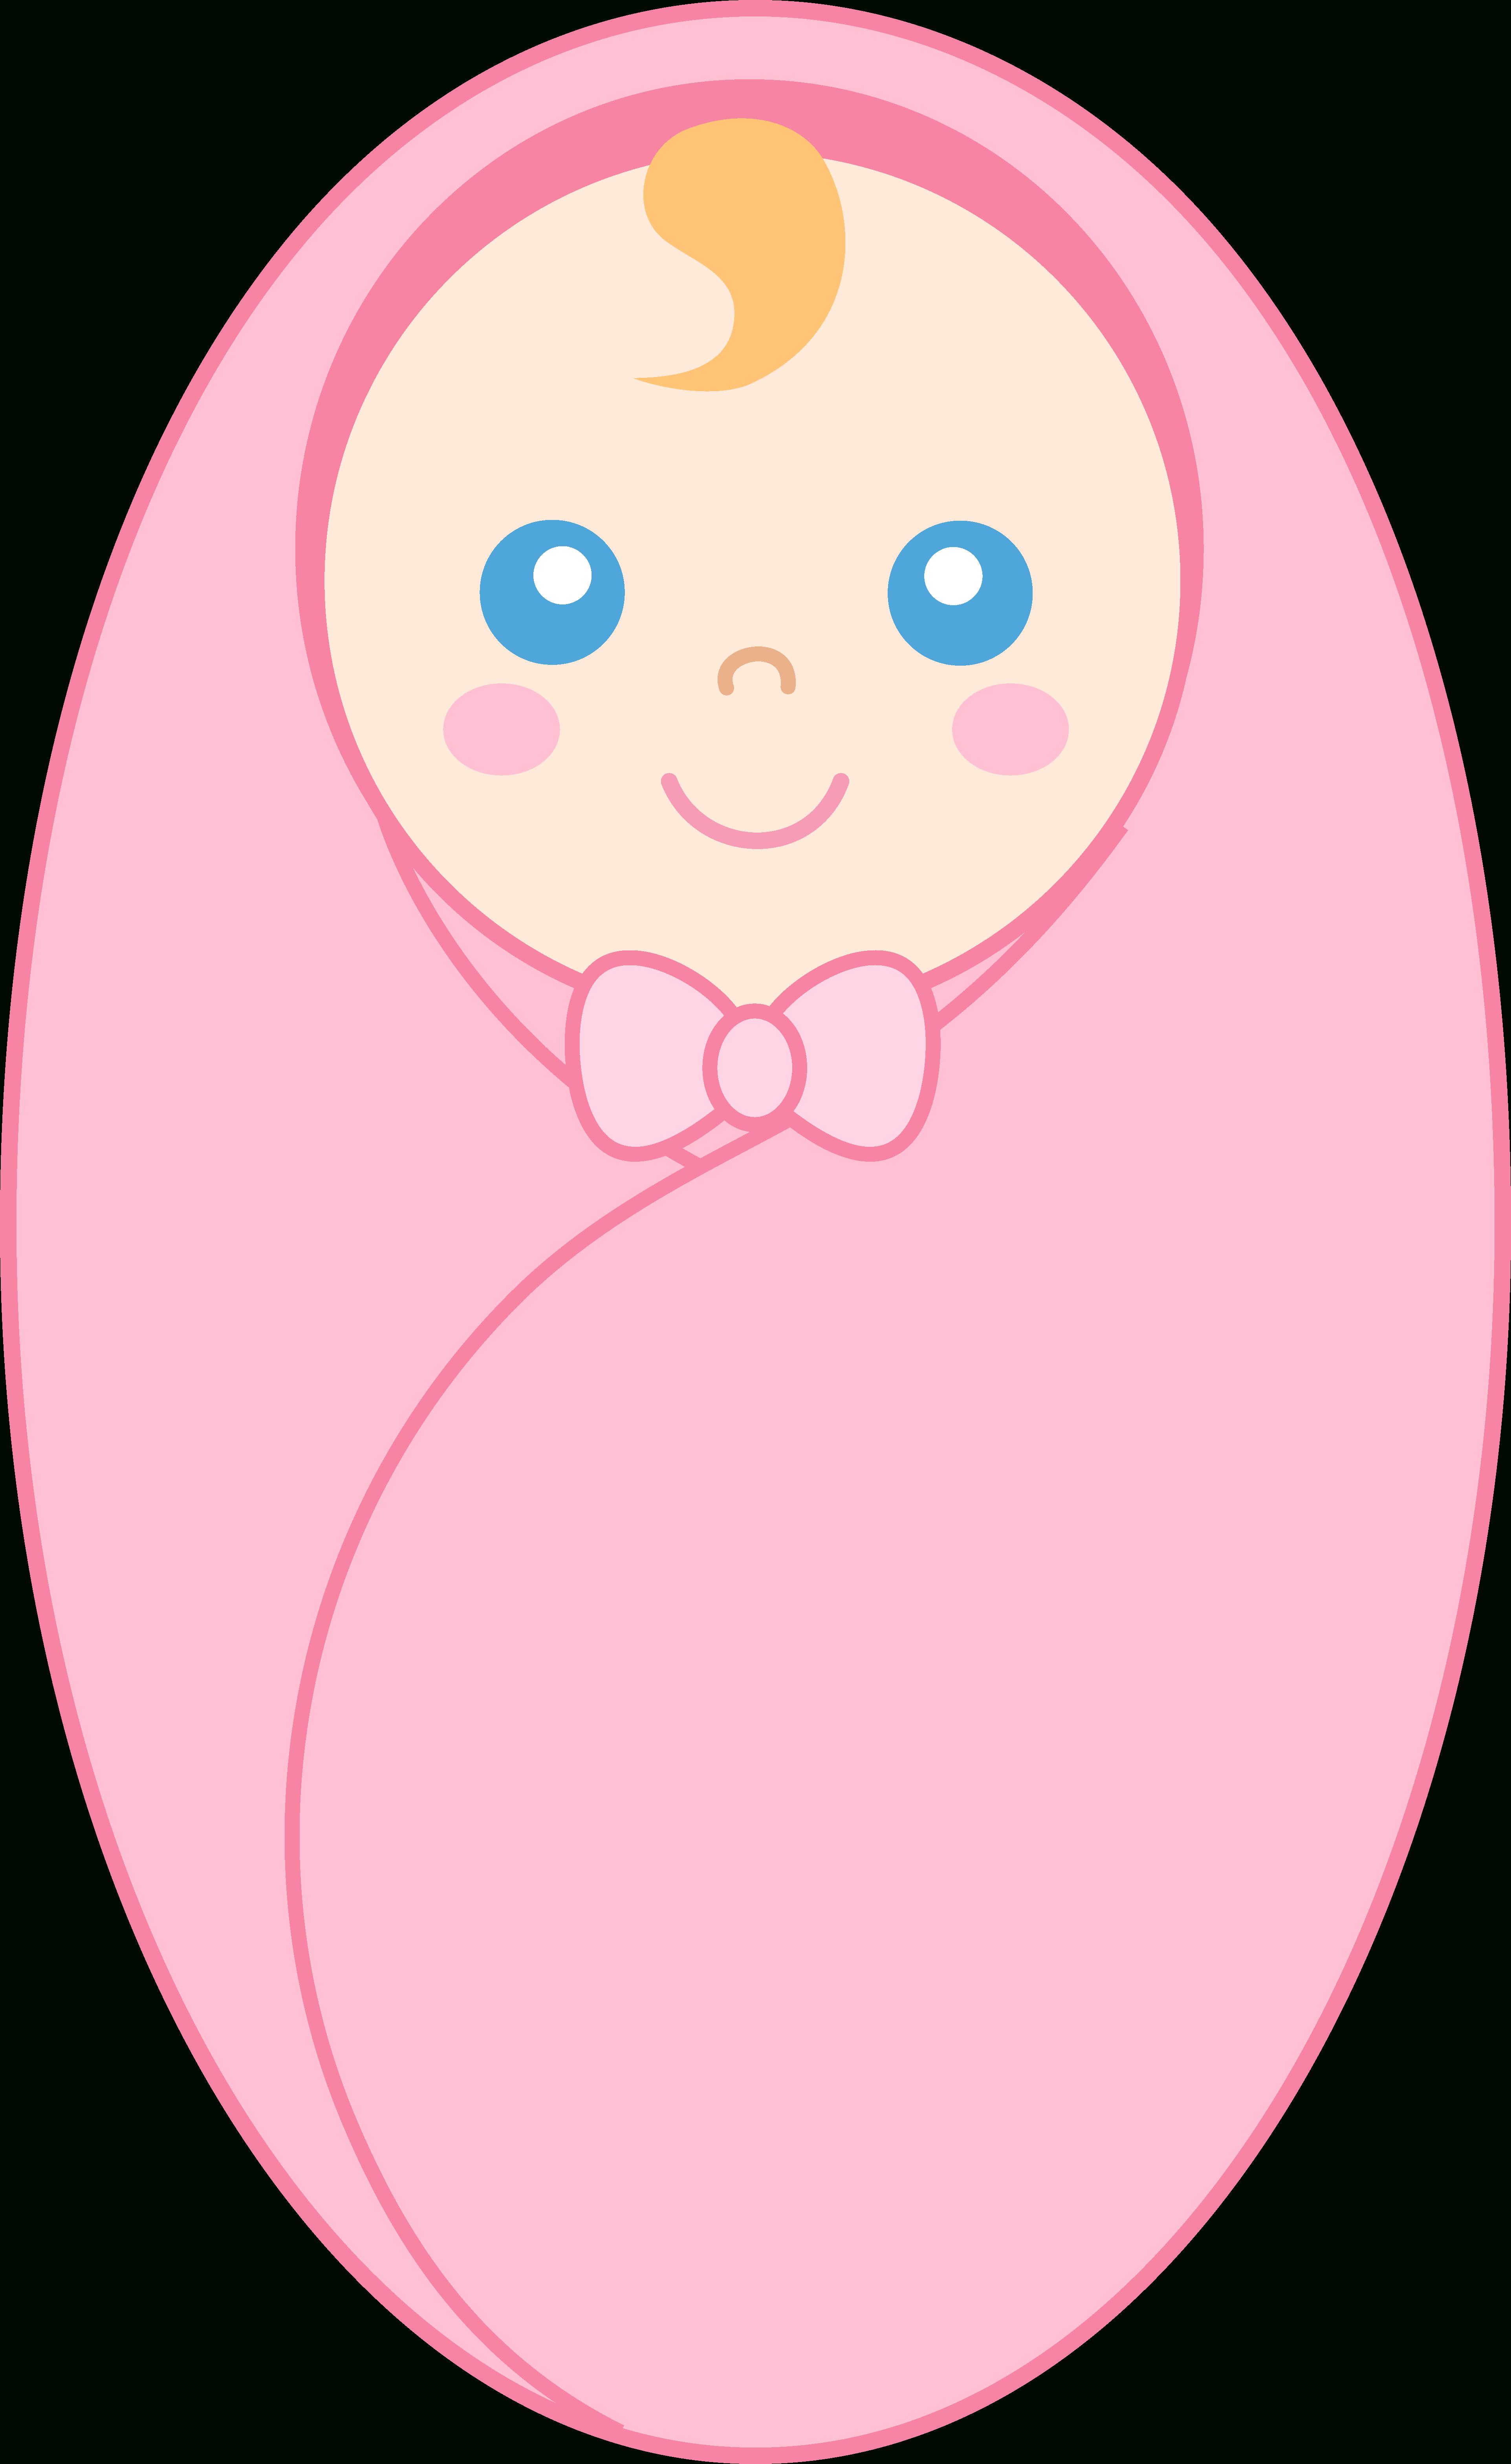 Babies clipart newborn. New born baby photo